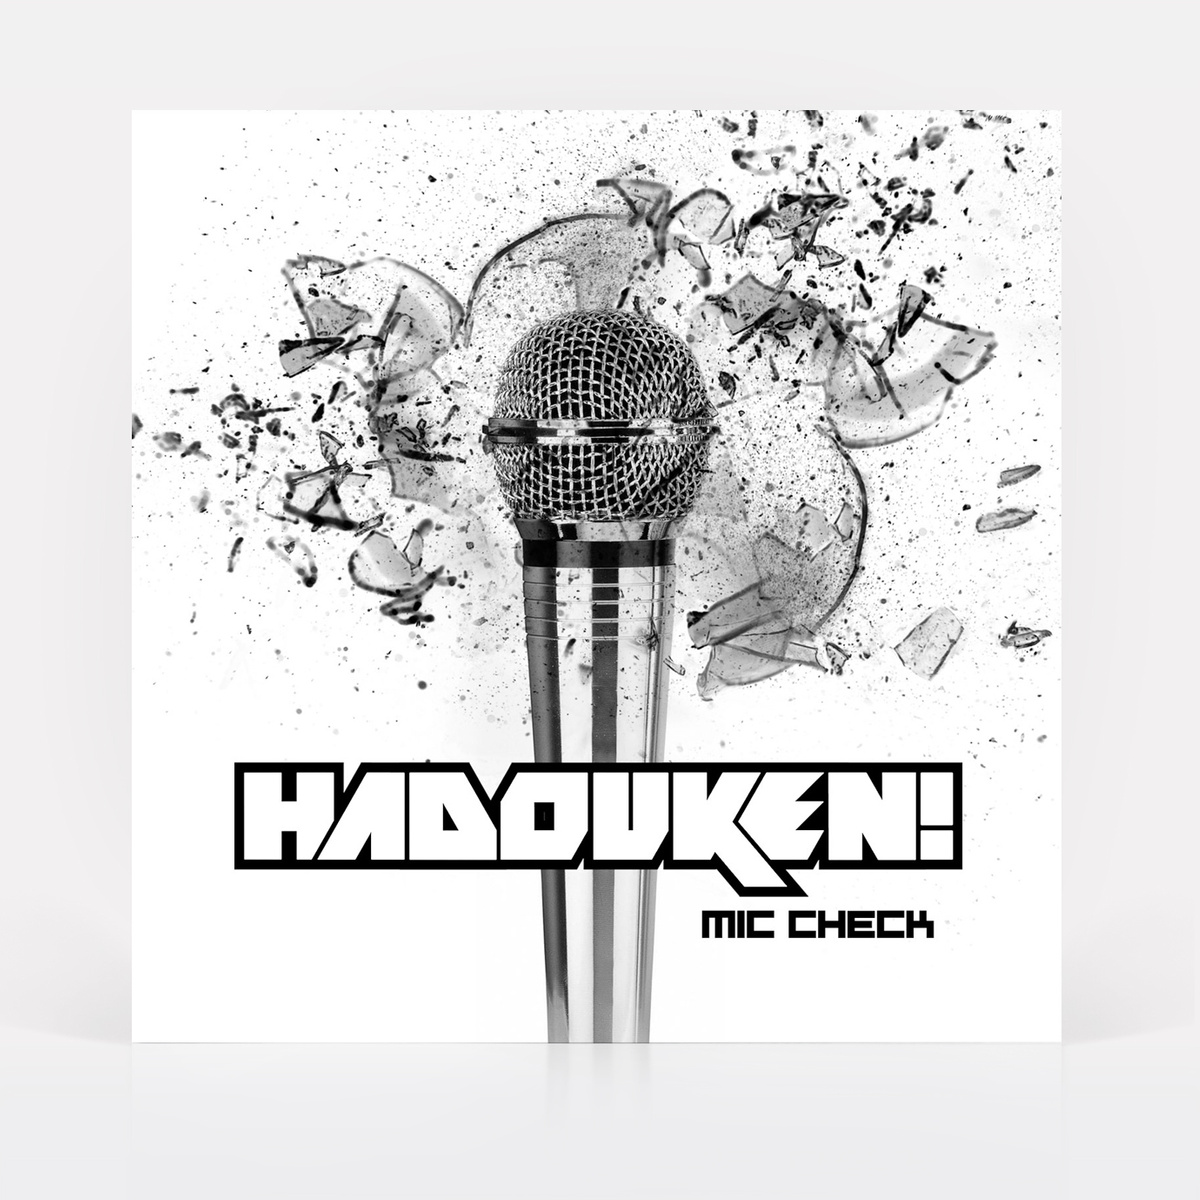 Hadouken Sound